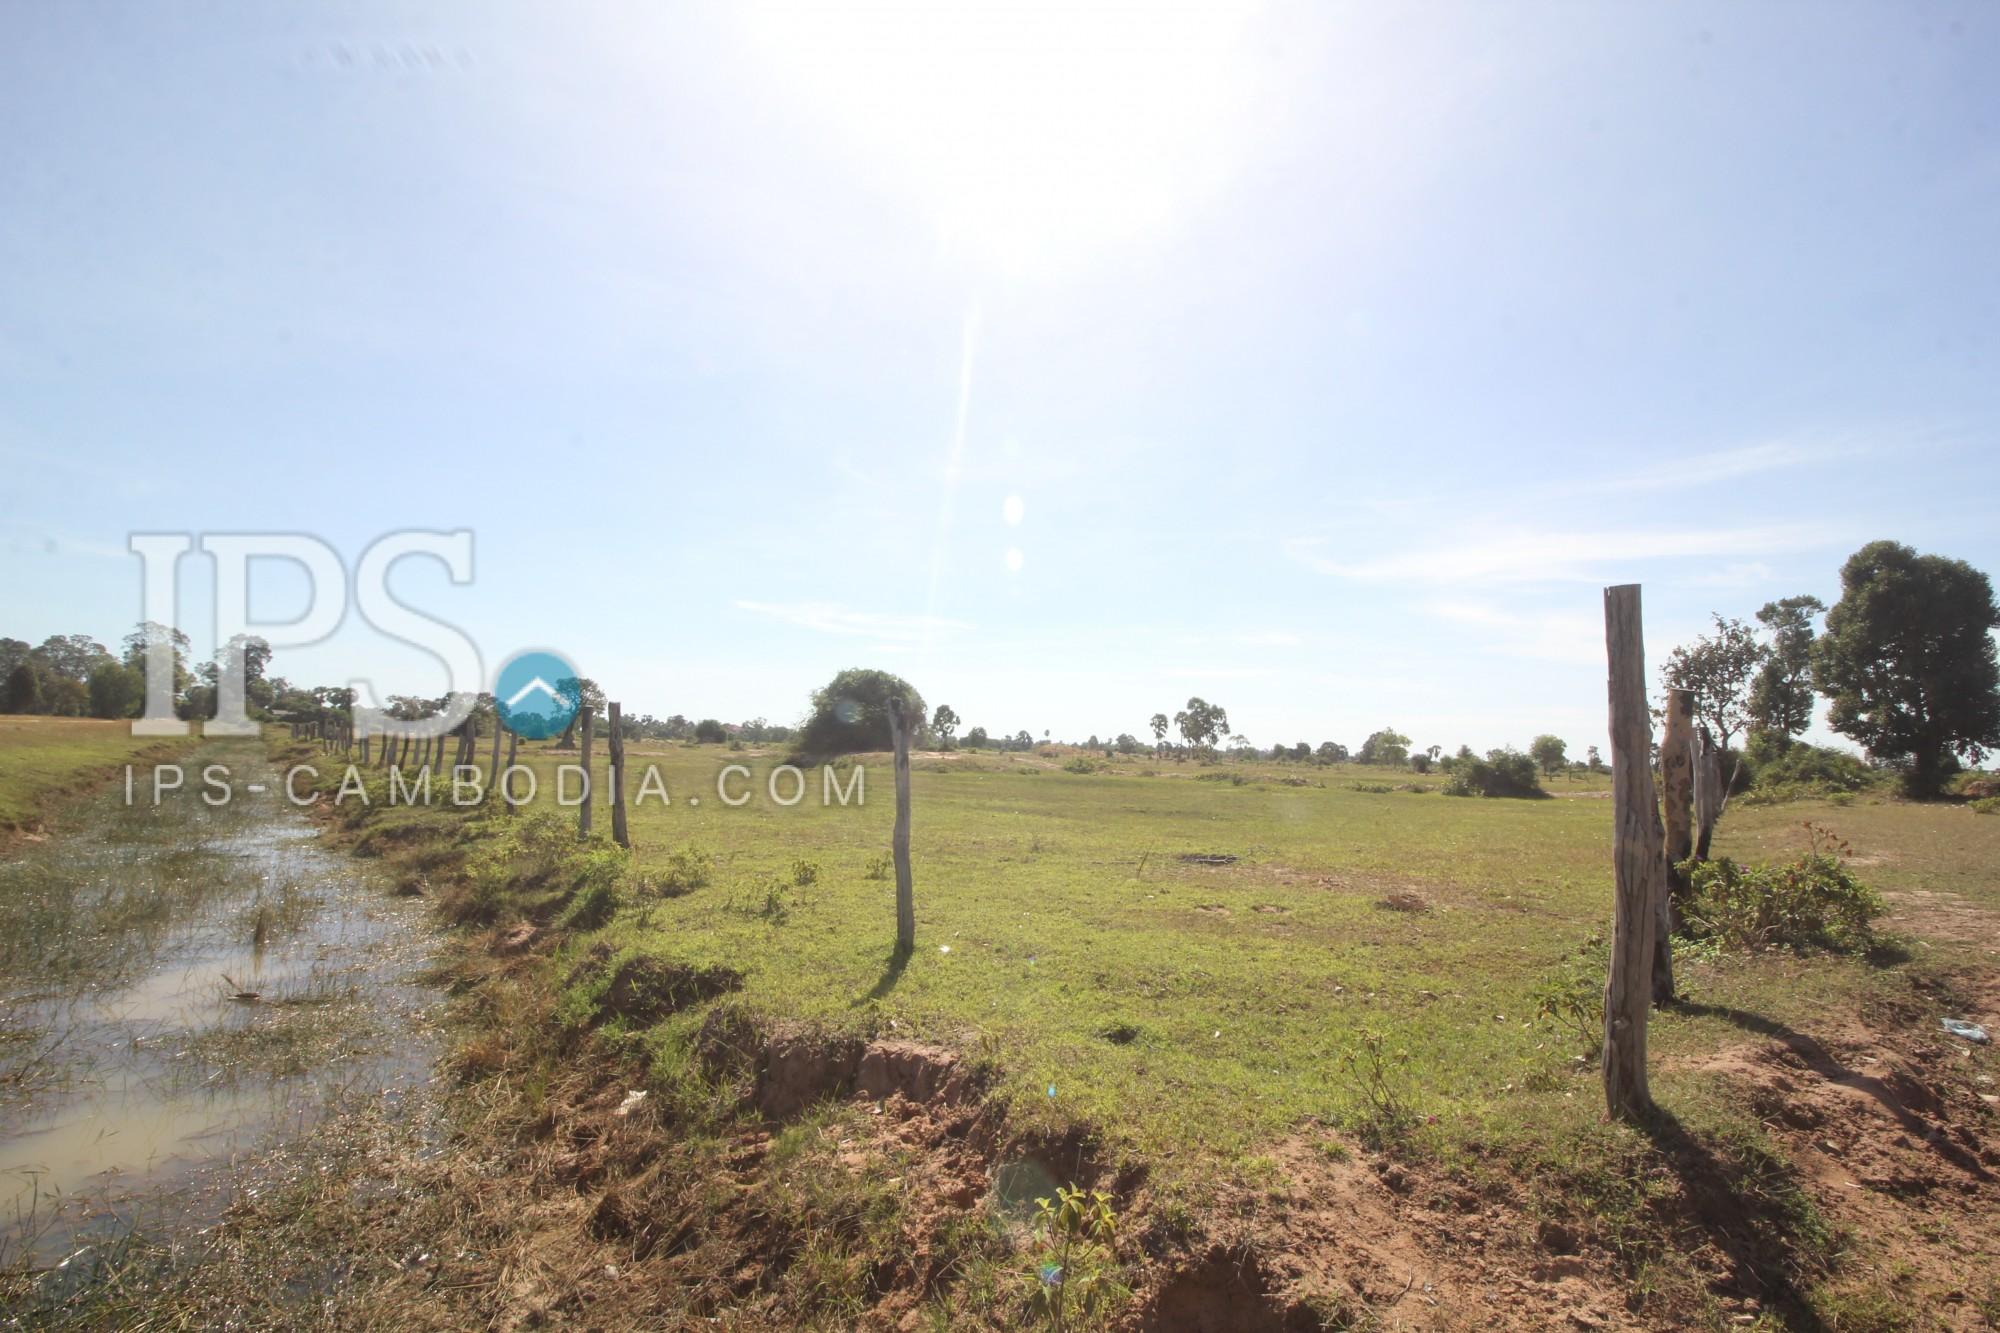 7,595 sq. m Land For Sale - Prasat Bakong District, Siem Reap